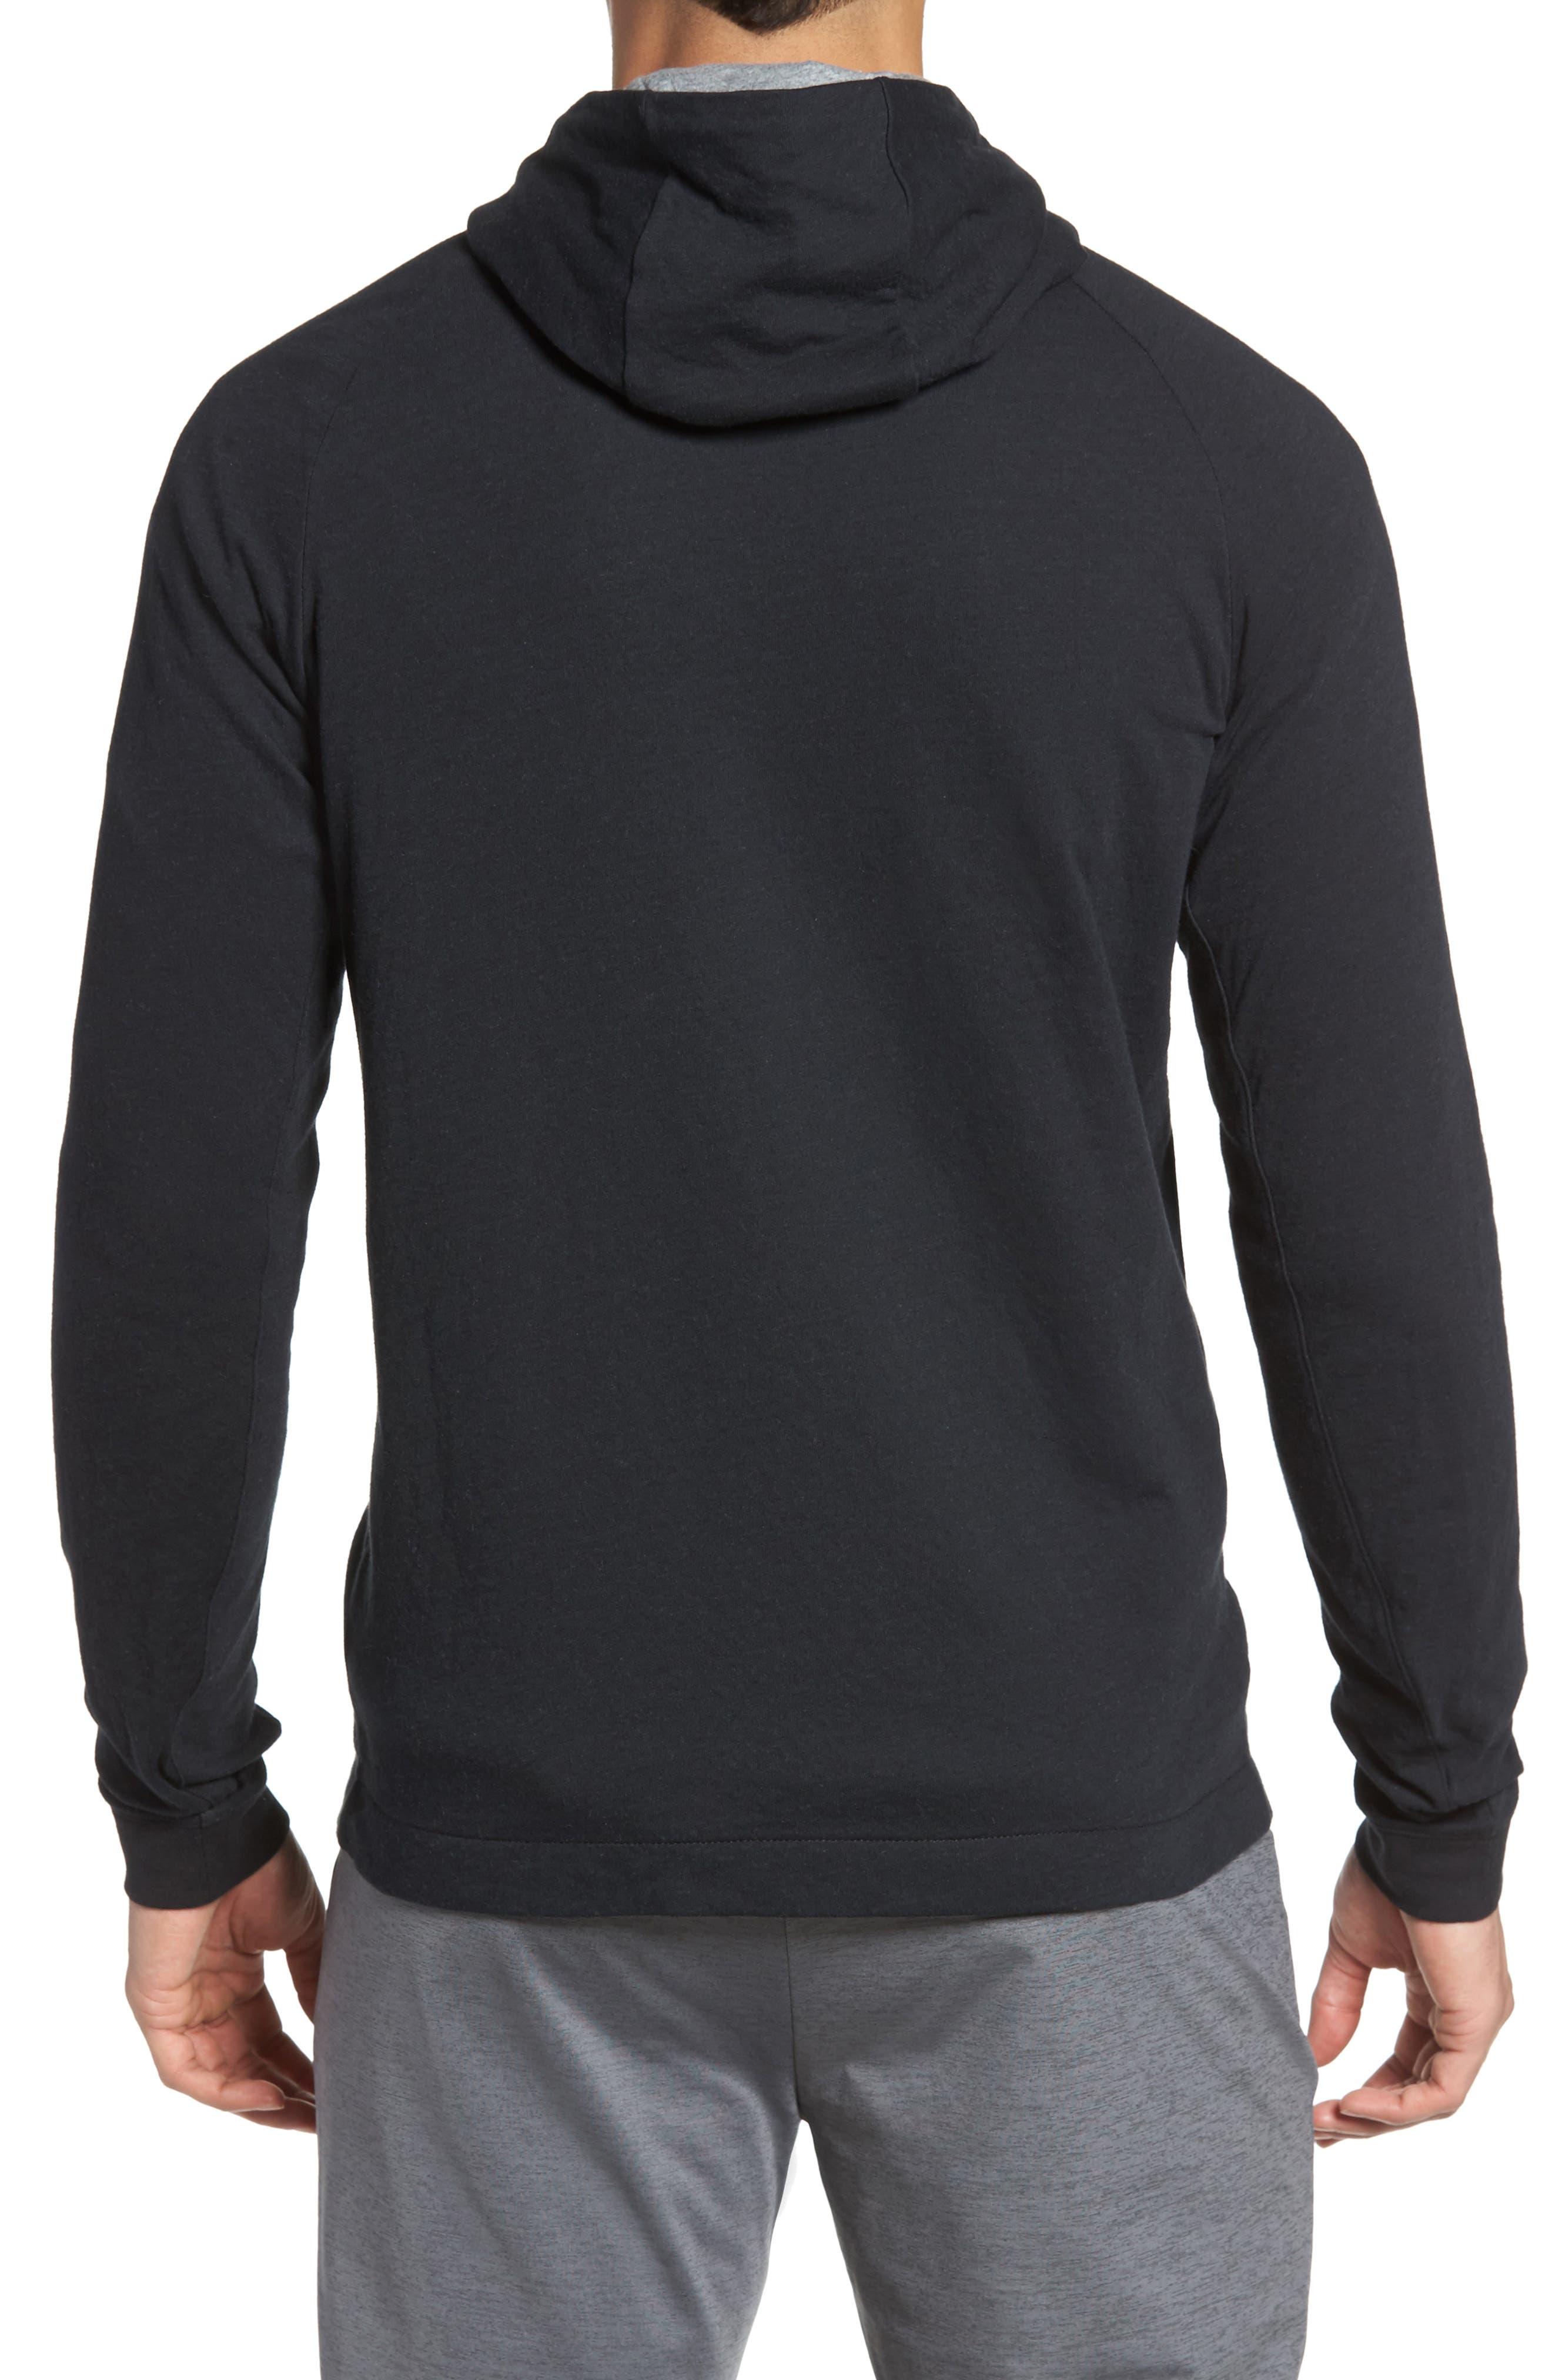 NIKE, Tech Regular Fit Fleece Hoodie, Alternate thumbnail 2, color, BLACK/ CARBON HEATHER